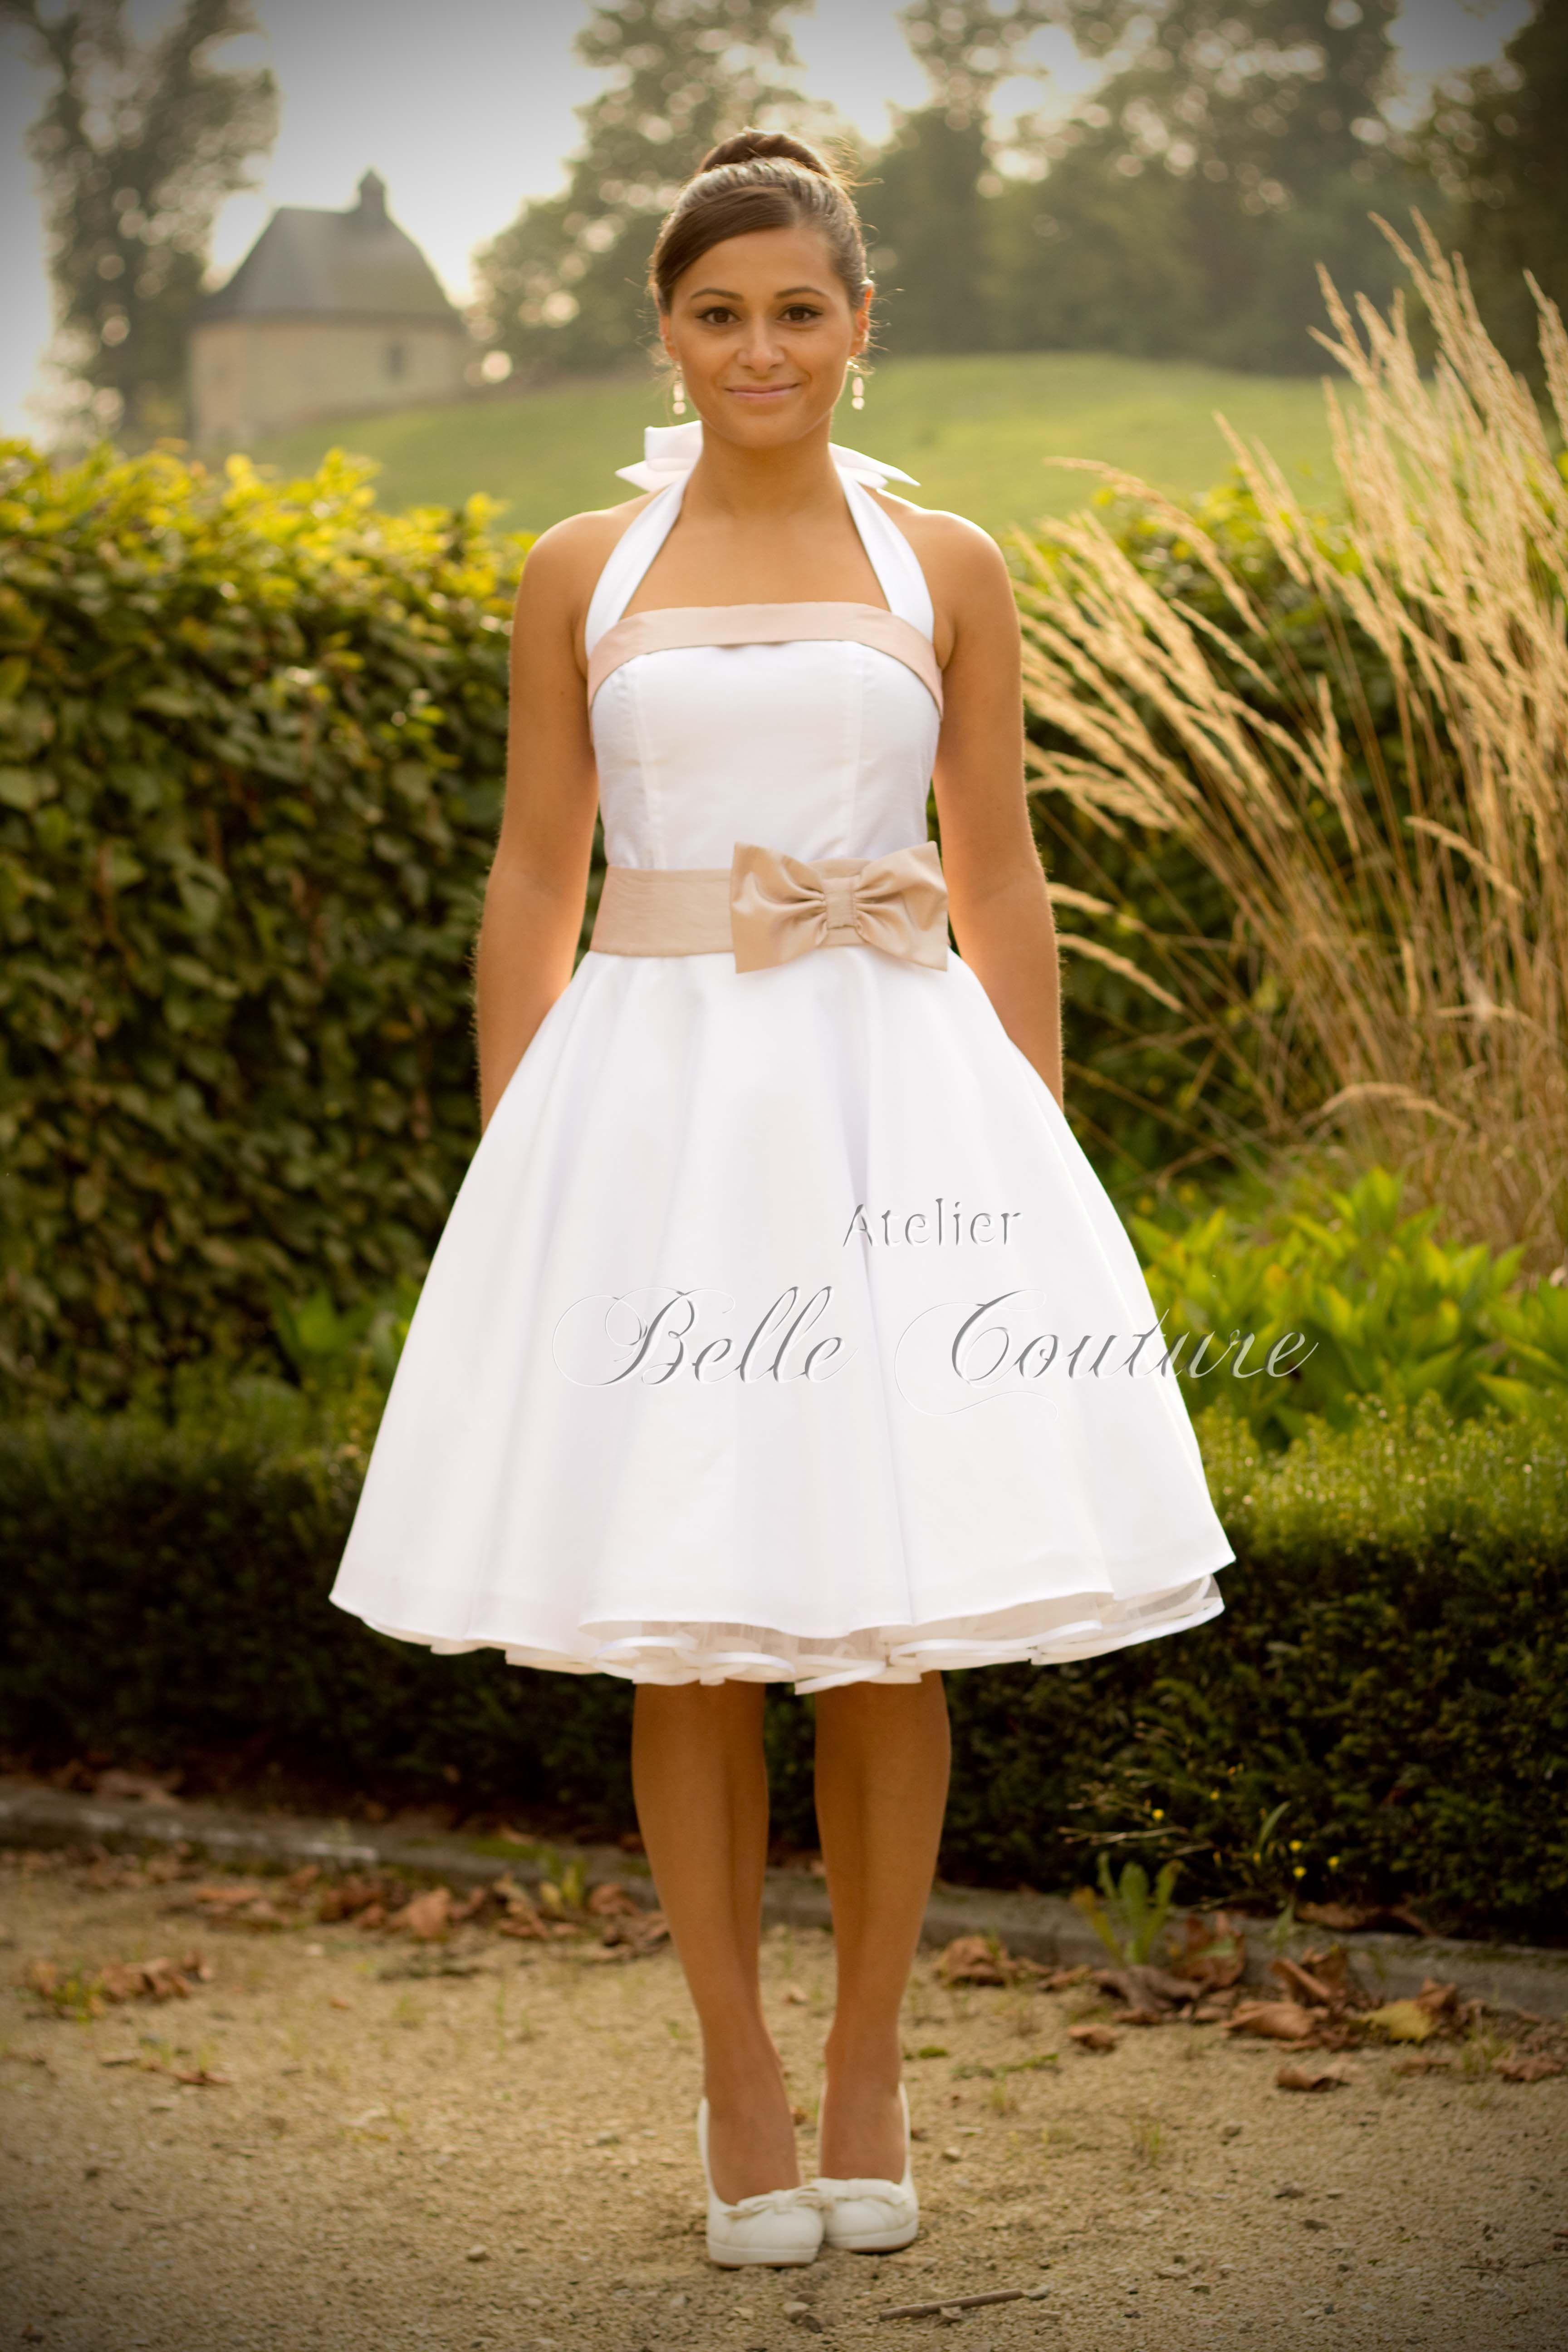 Hochzeitskleid Petticoat  Petticoat kleid hochzeit